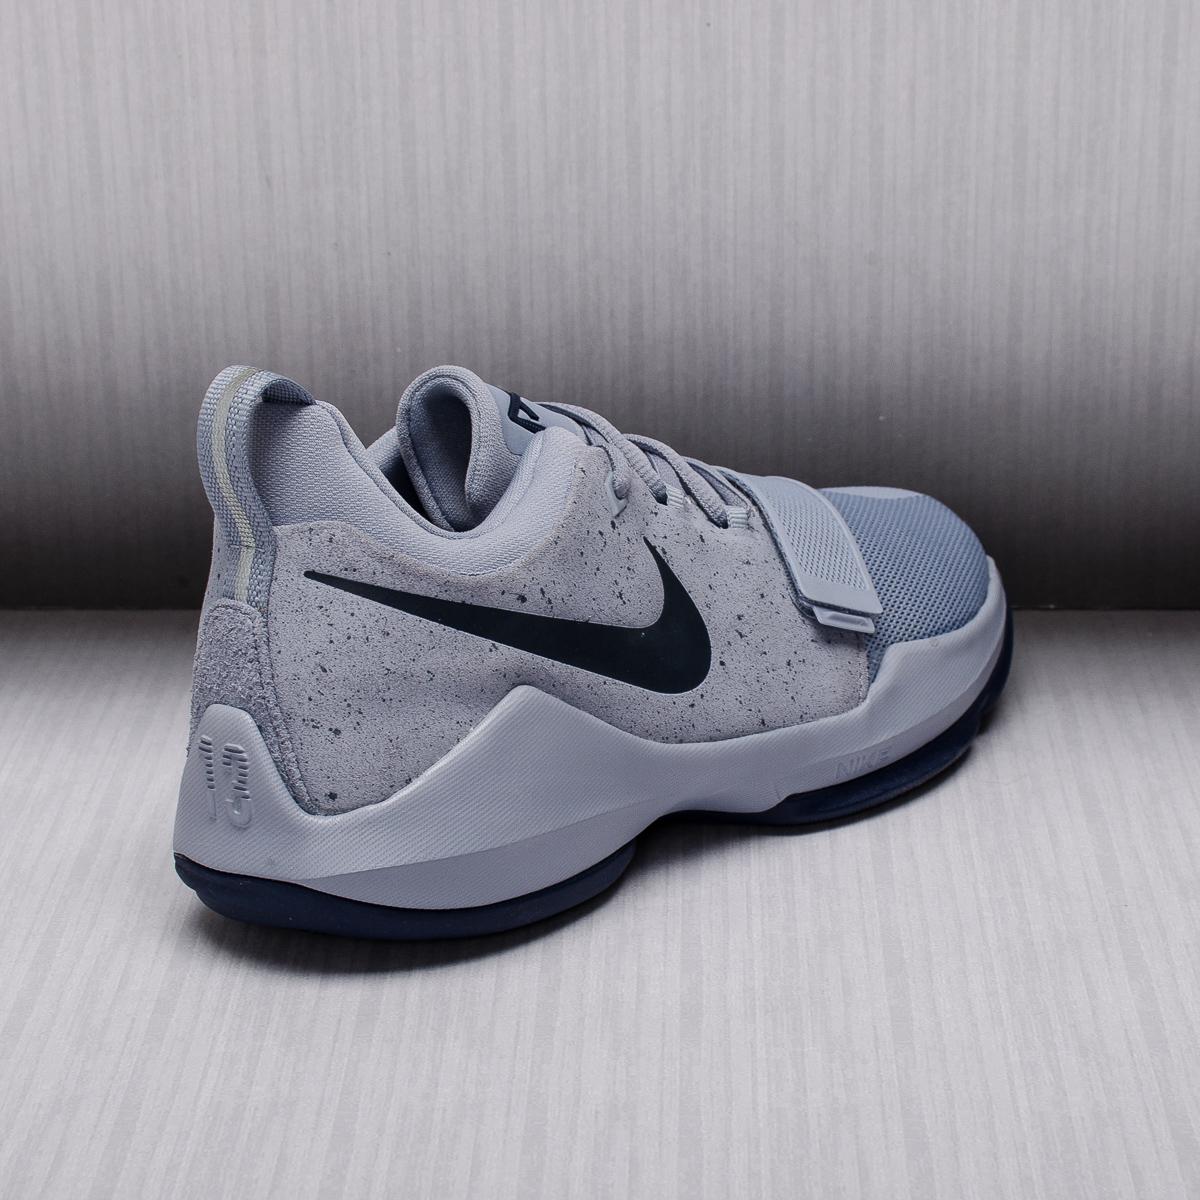 Nike PG 1 GS Junior Basketball Shoes - BASKETBALL SHOES ...